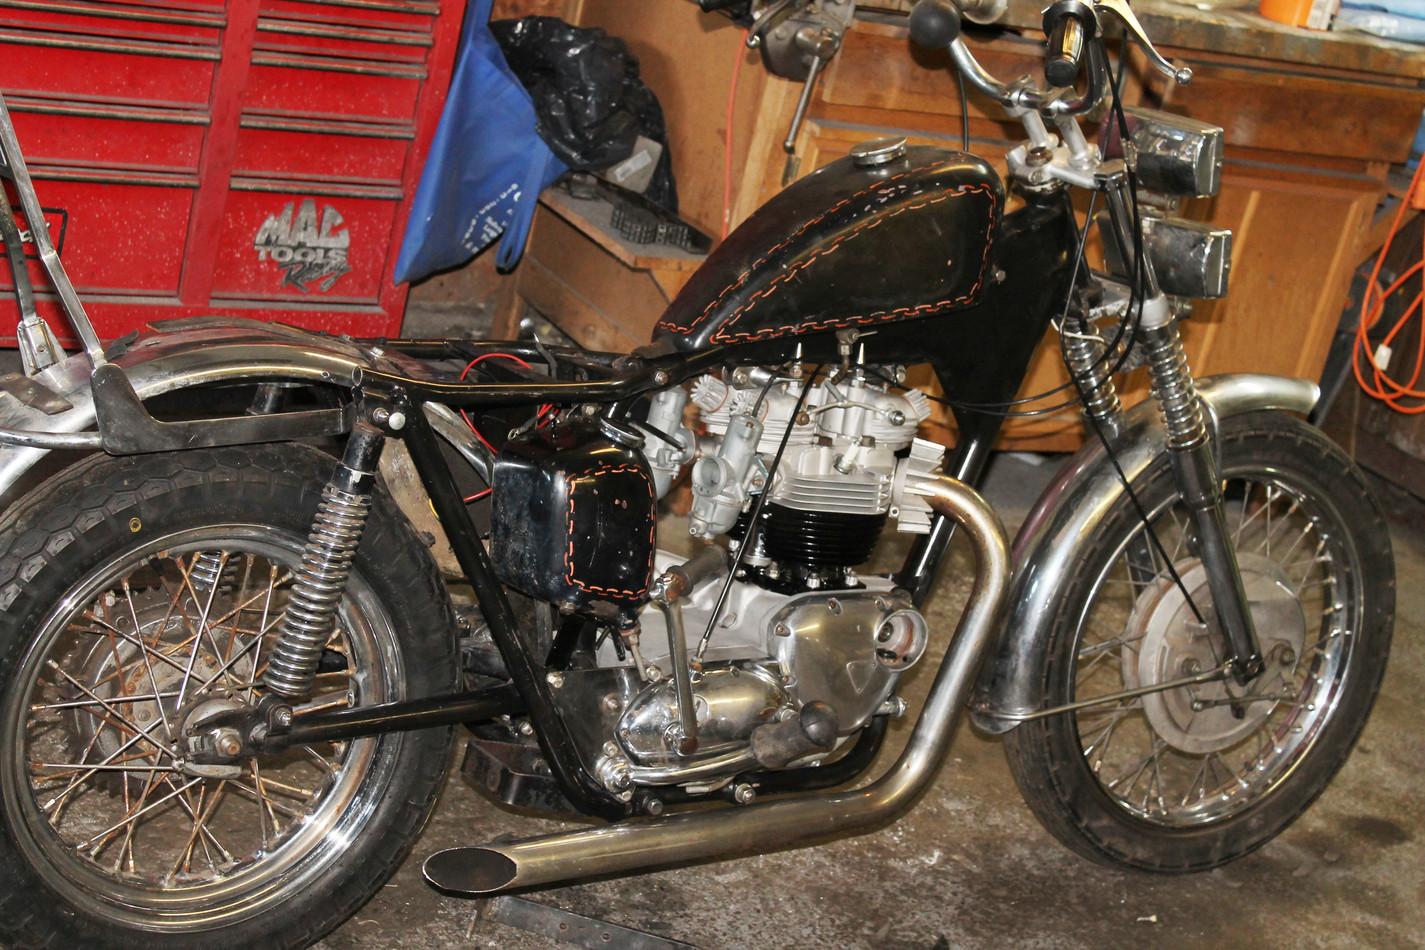 1960s 650 Triumph TR6R motorcycle